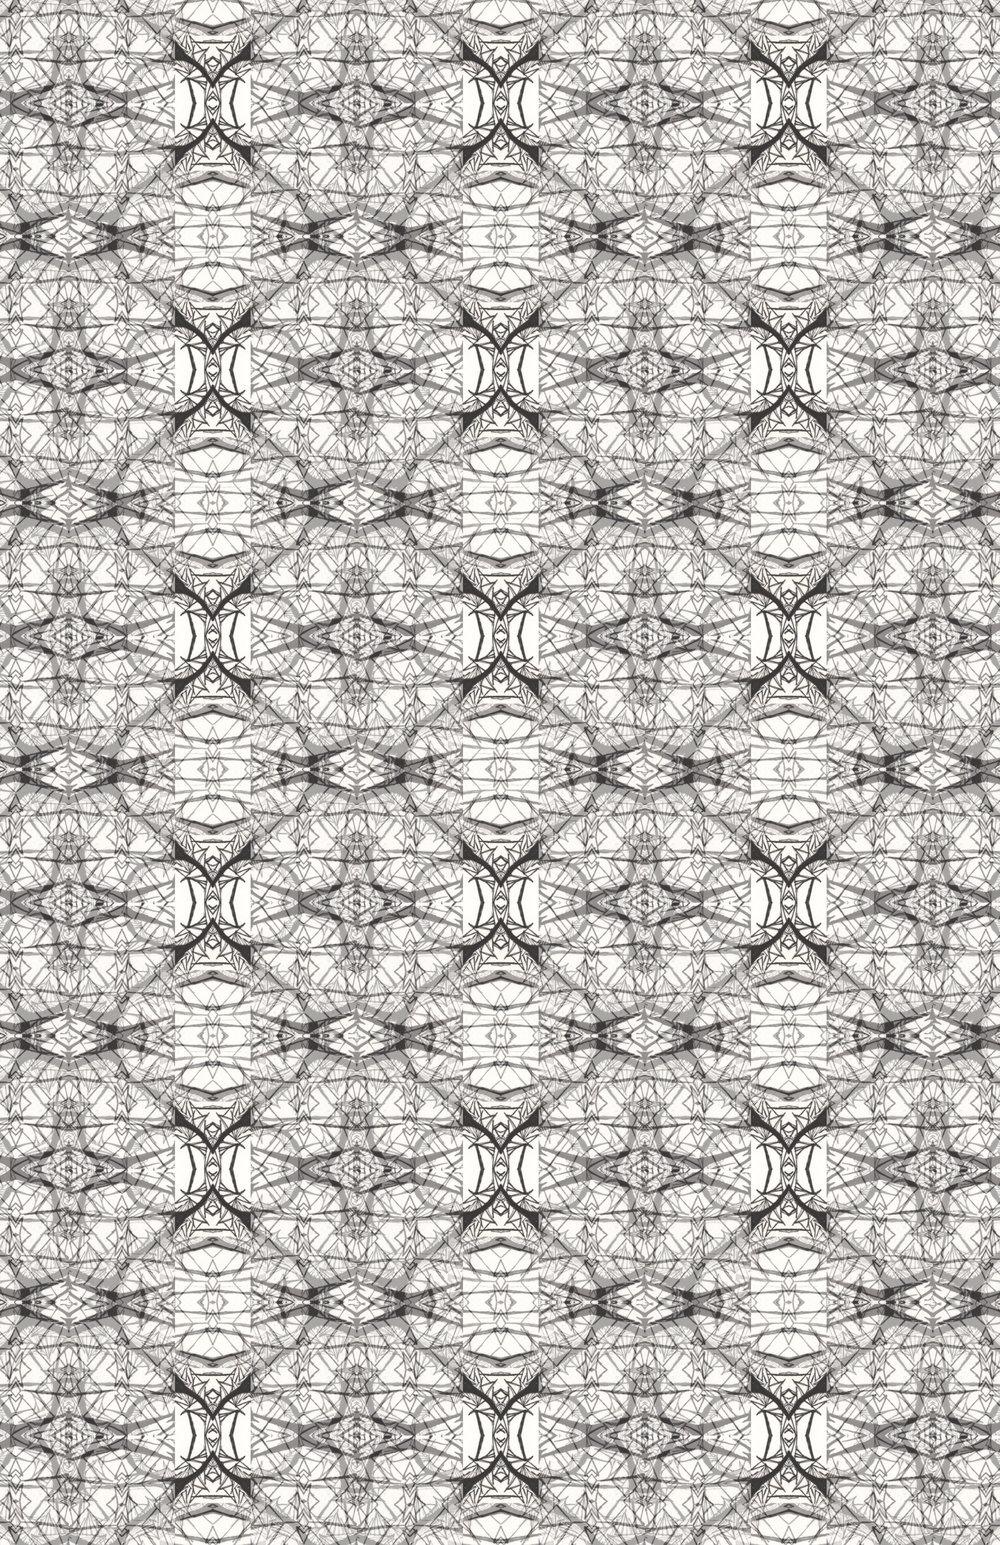 pattern8-2.jpg